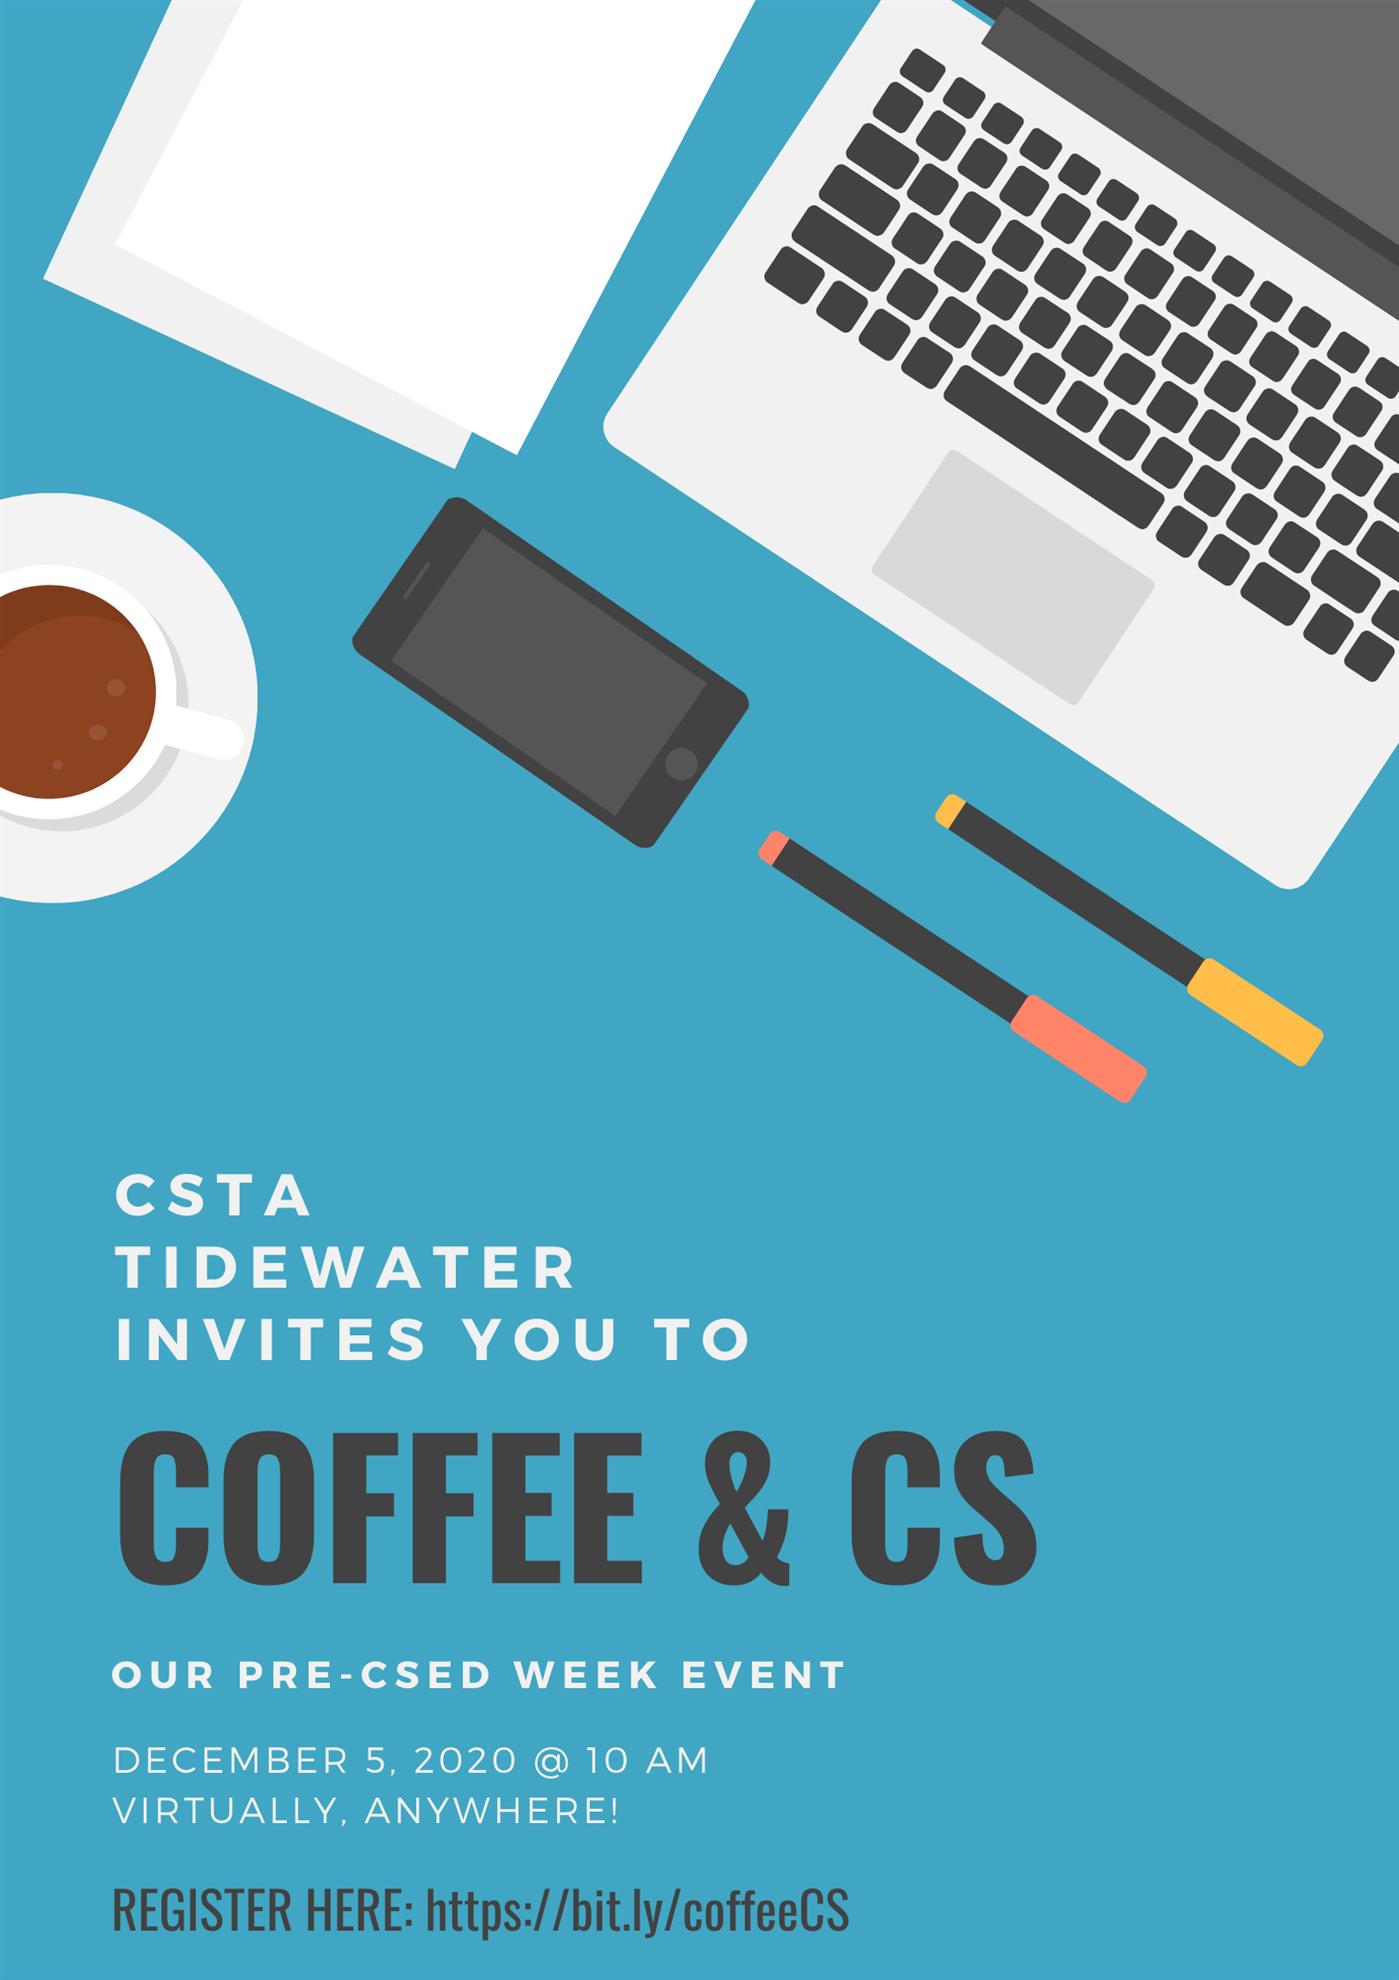 Coffee & CS (CSTA Tidewater Virginia)